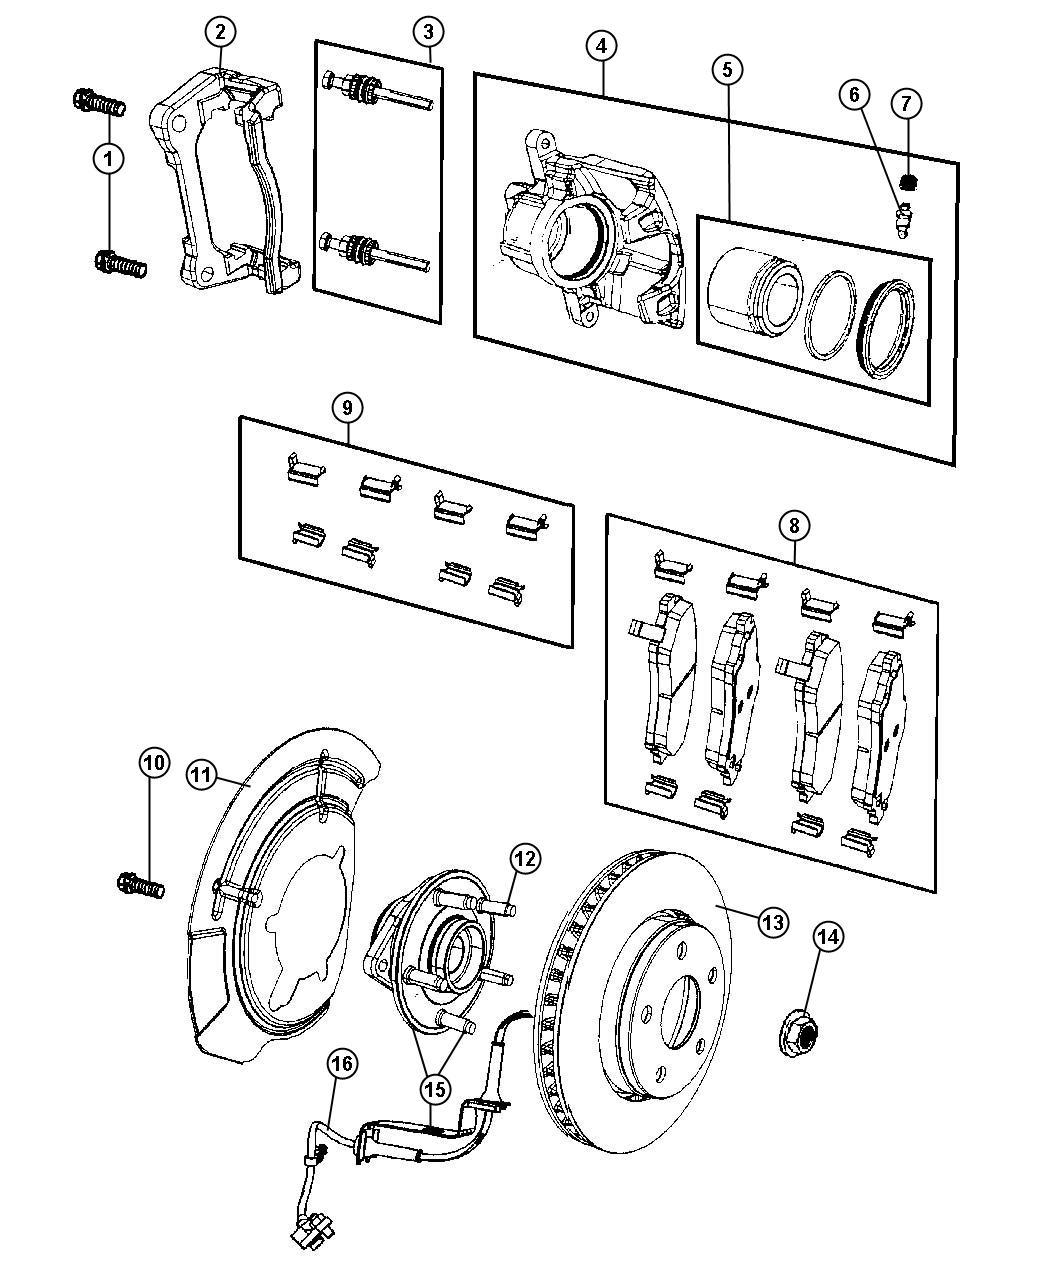 2012 Jeep Liberty Sensor kit, sensor package. Anti-lock